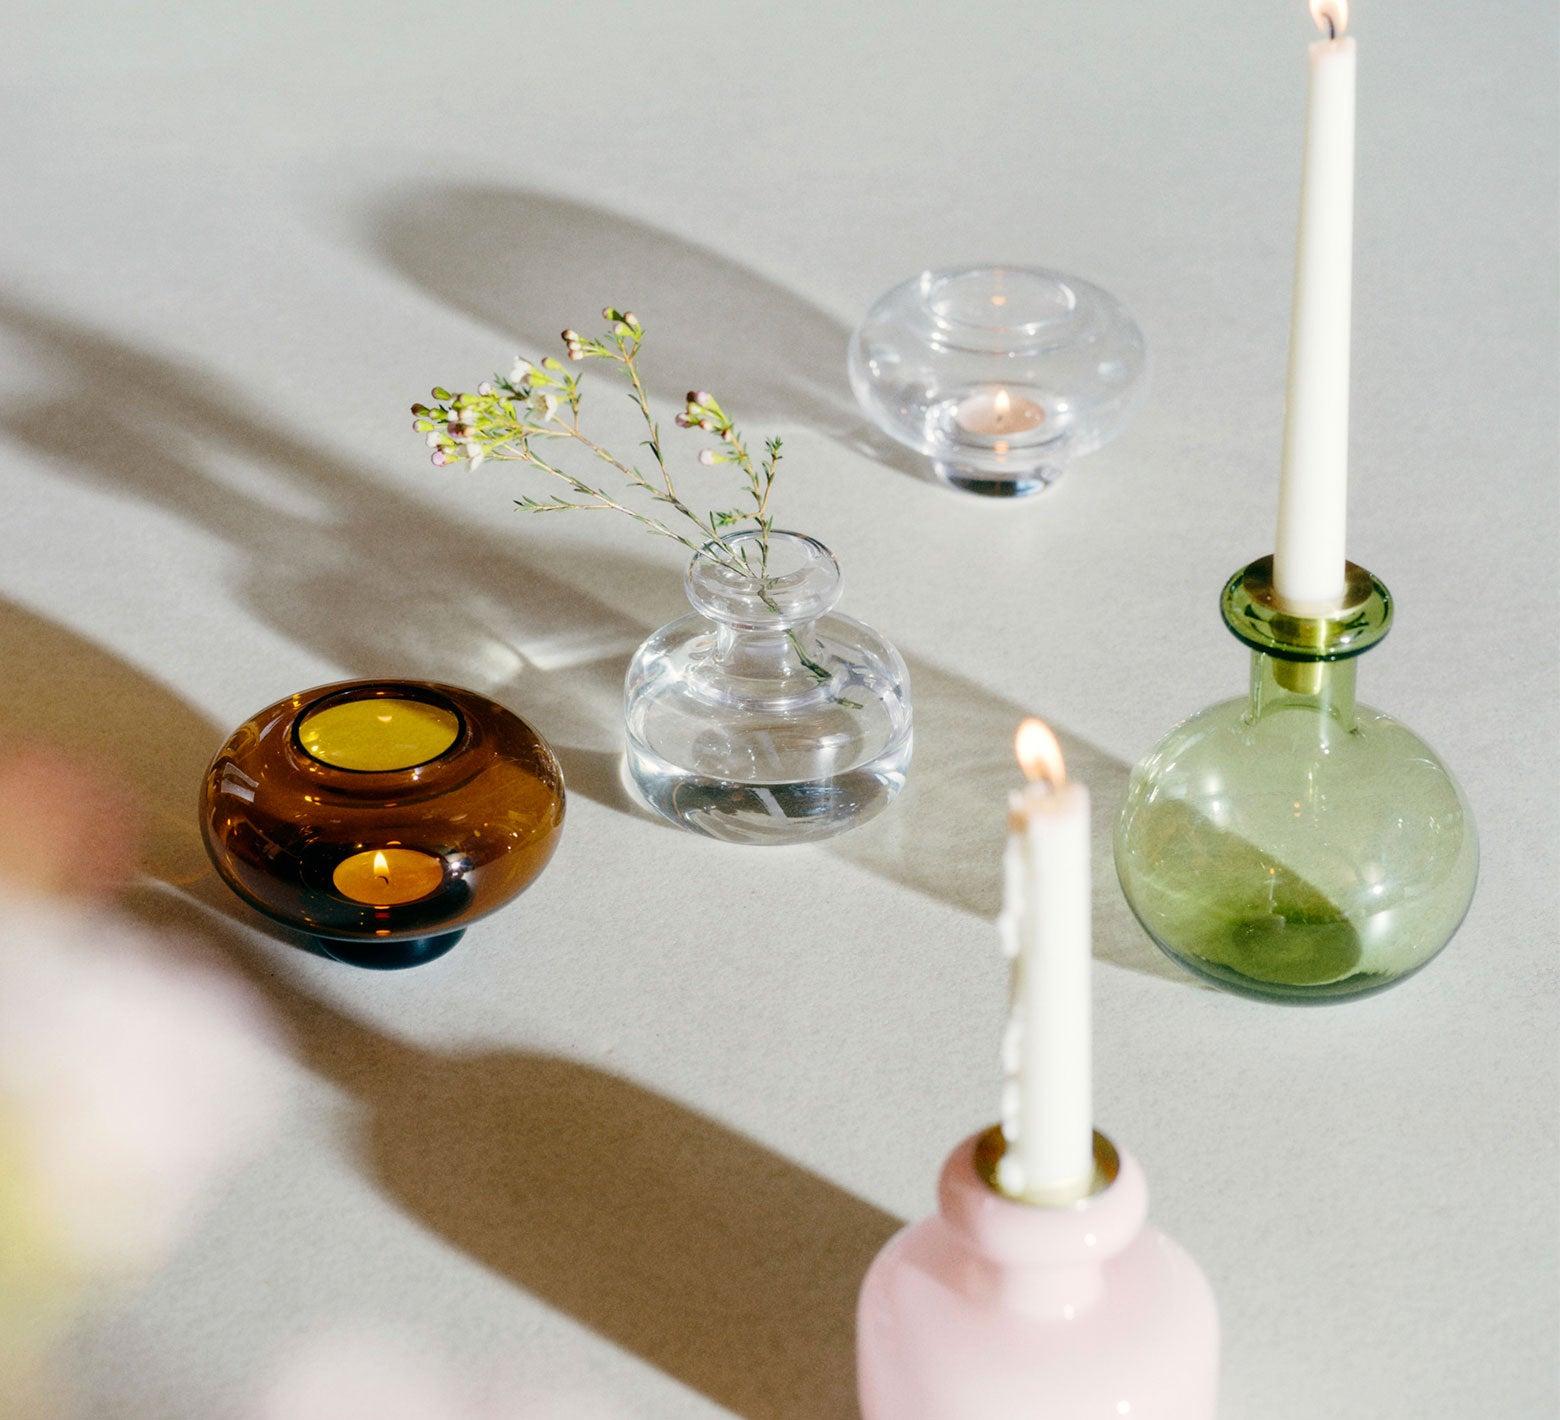 Marimekko vases and candle holders